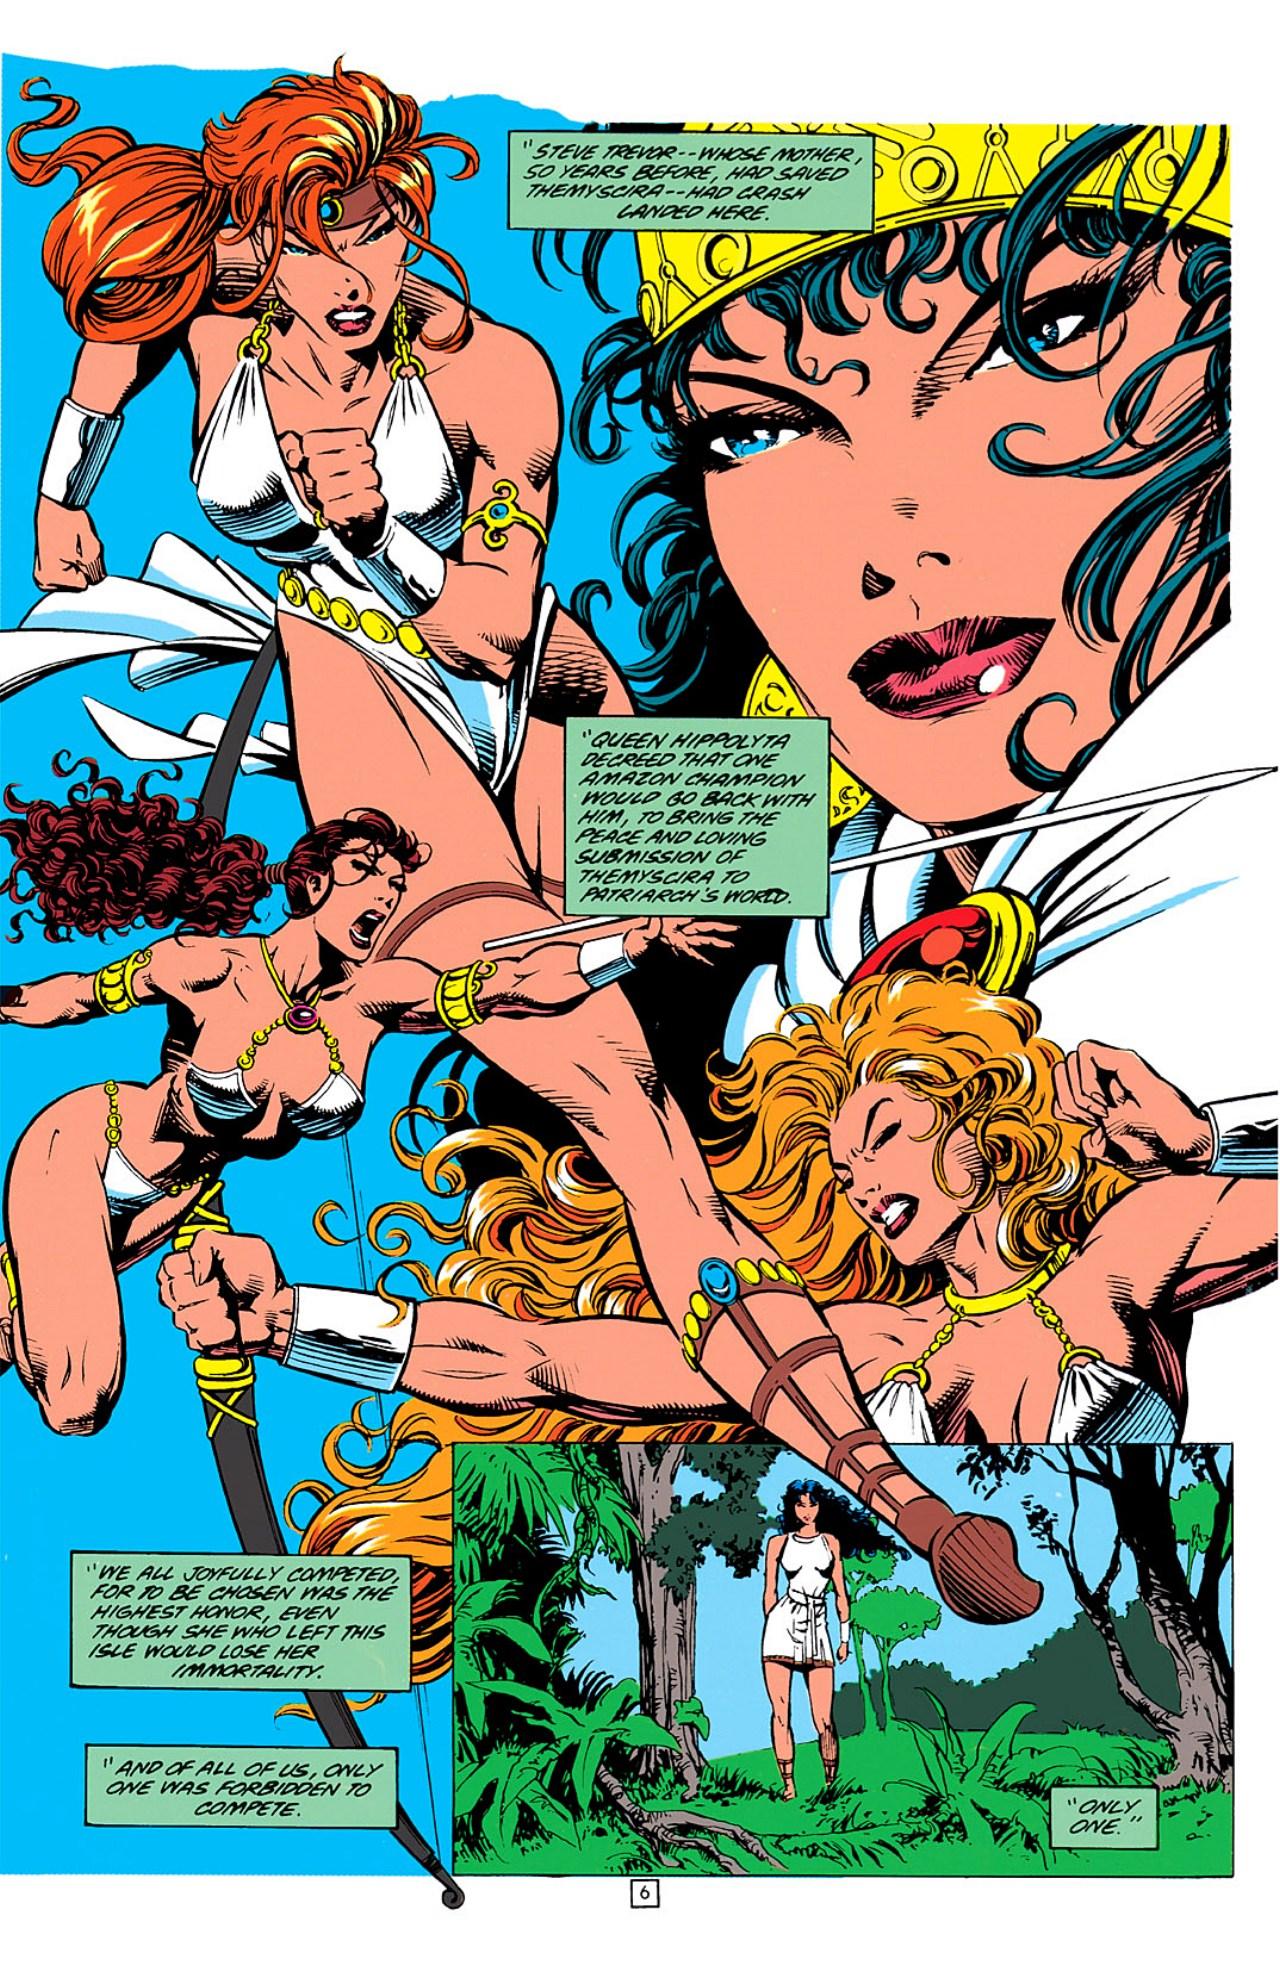 Read online Wonder Woman (1987) comic -  Issue #0 - 7